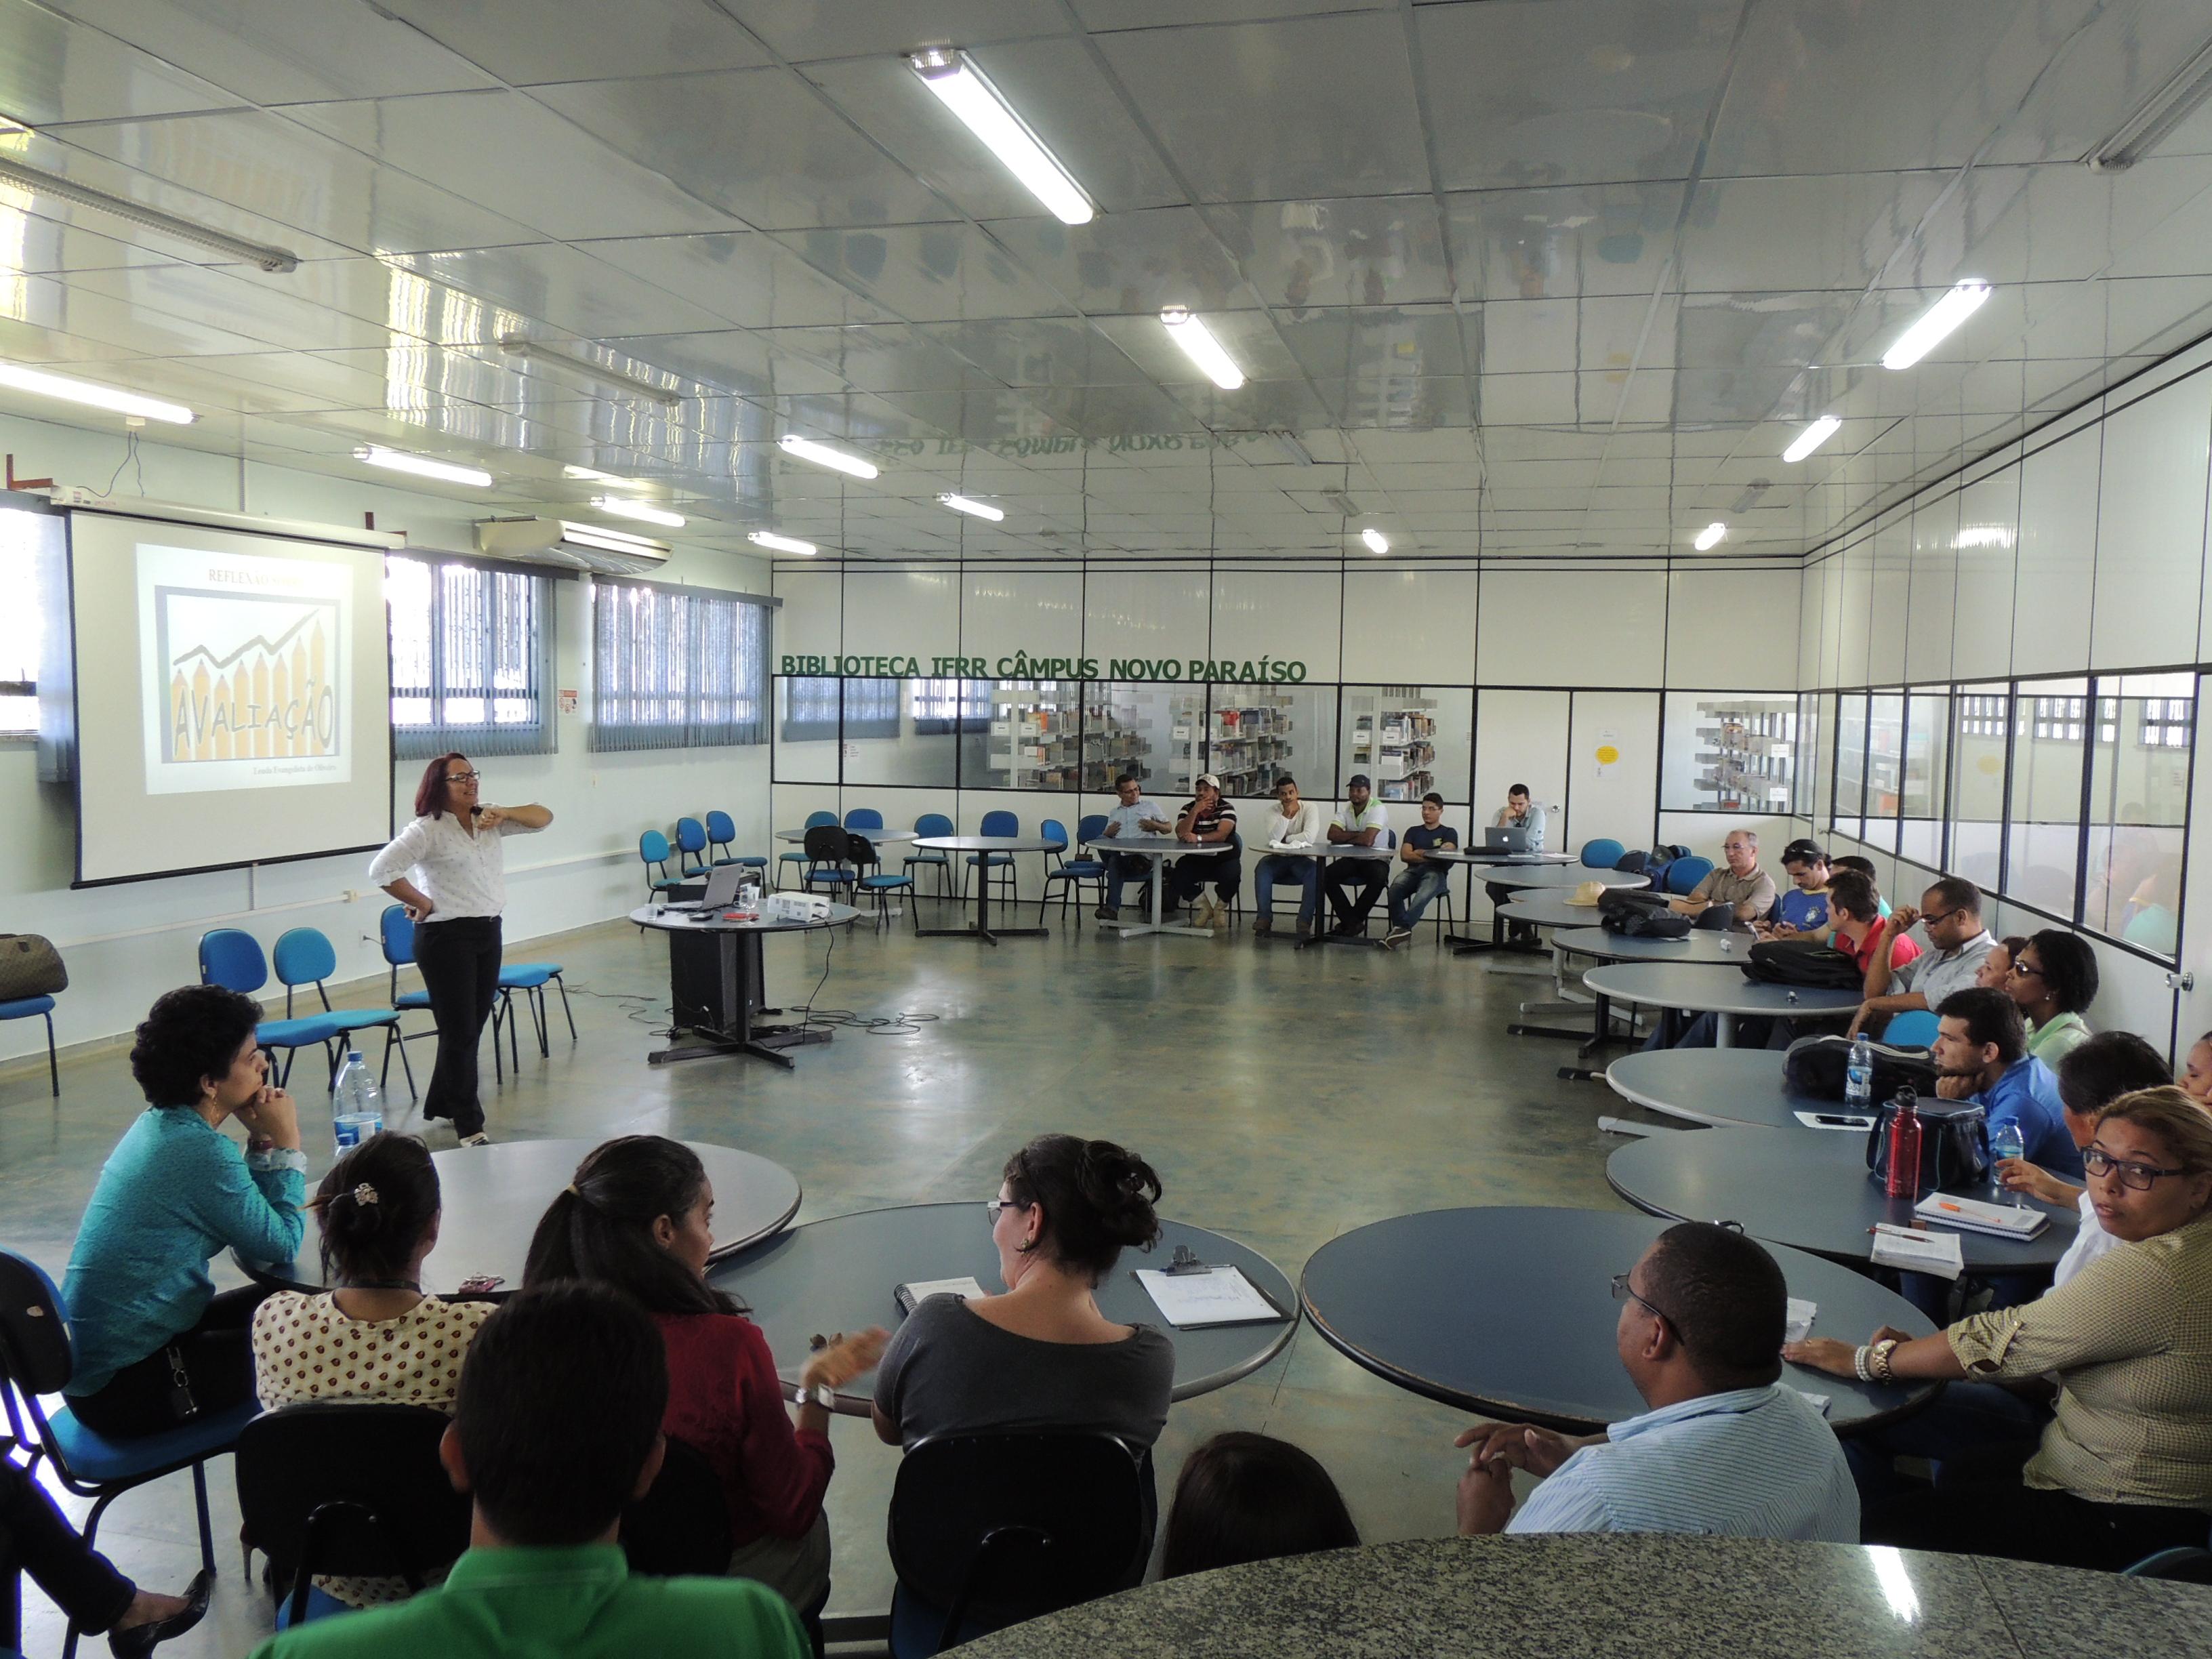 Câmpus Novo Paraíso realiza segundo encontro pedagógico de 2015